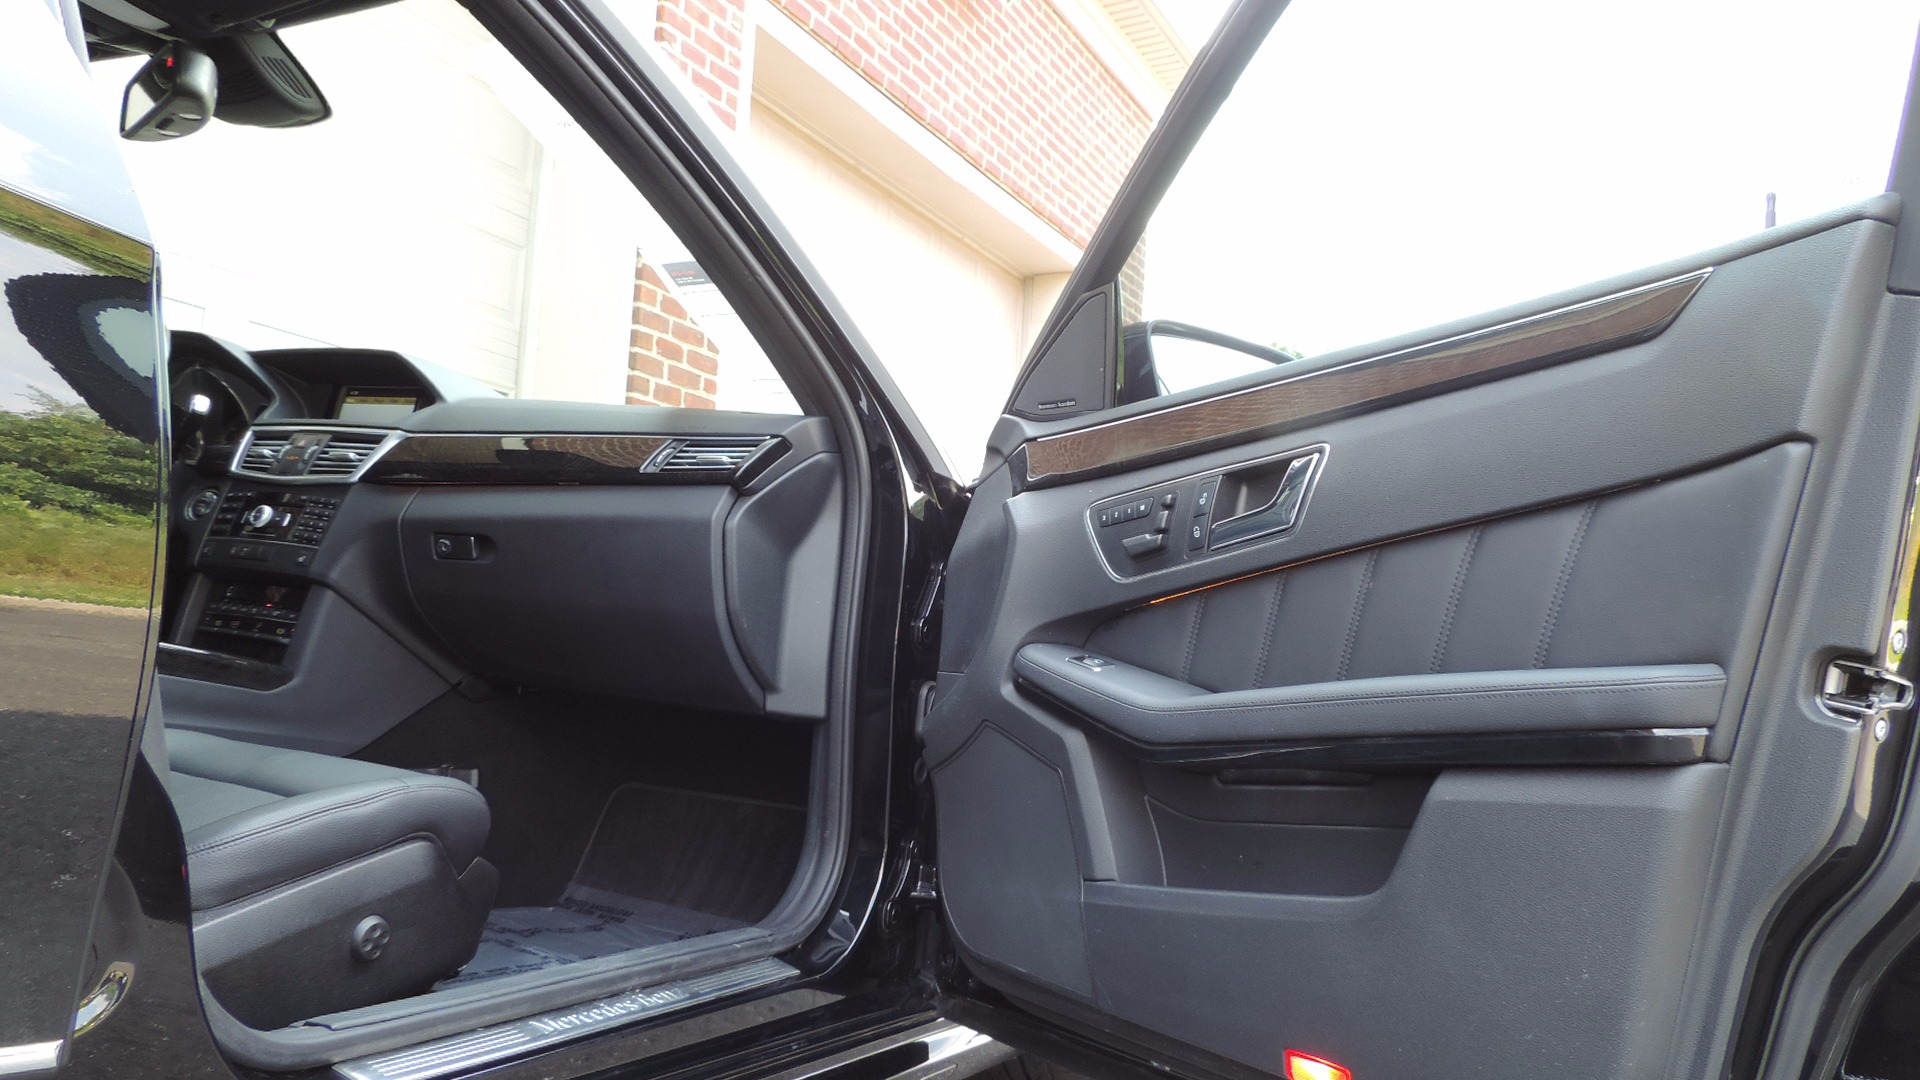 Mercedes-Benz E-Class: NECK-PRO head restraints